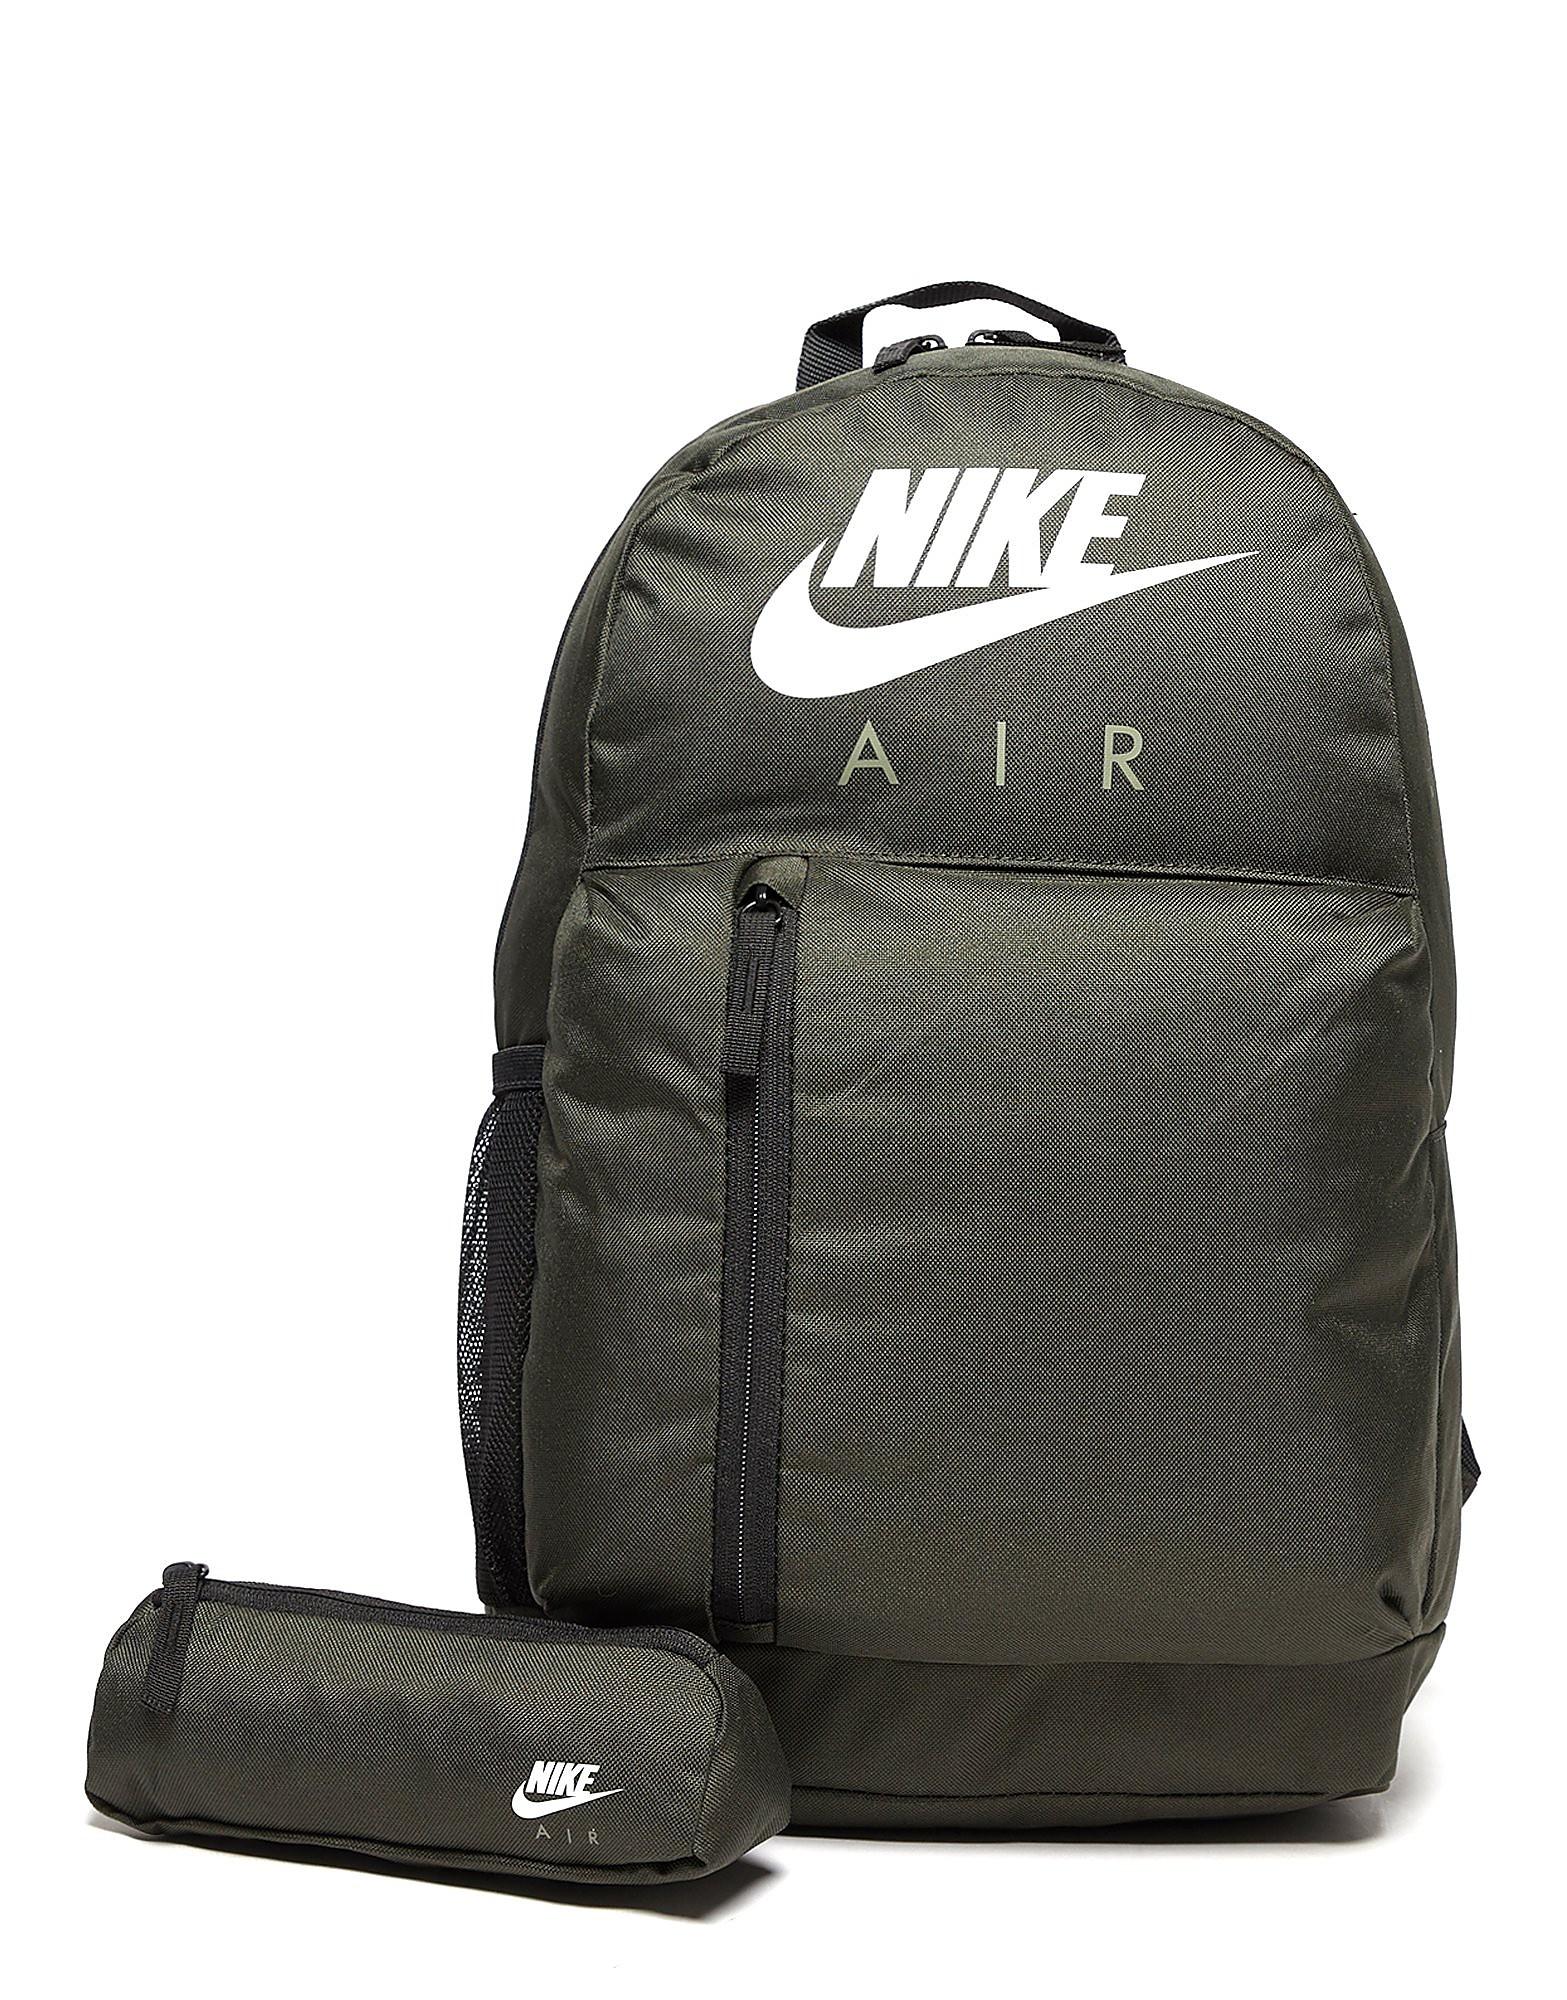 Nike Sac à dos Elemental Homme